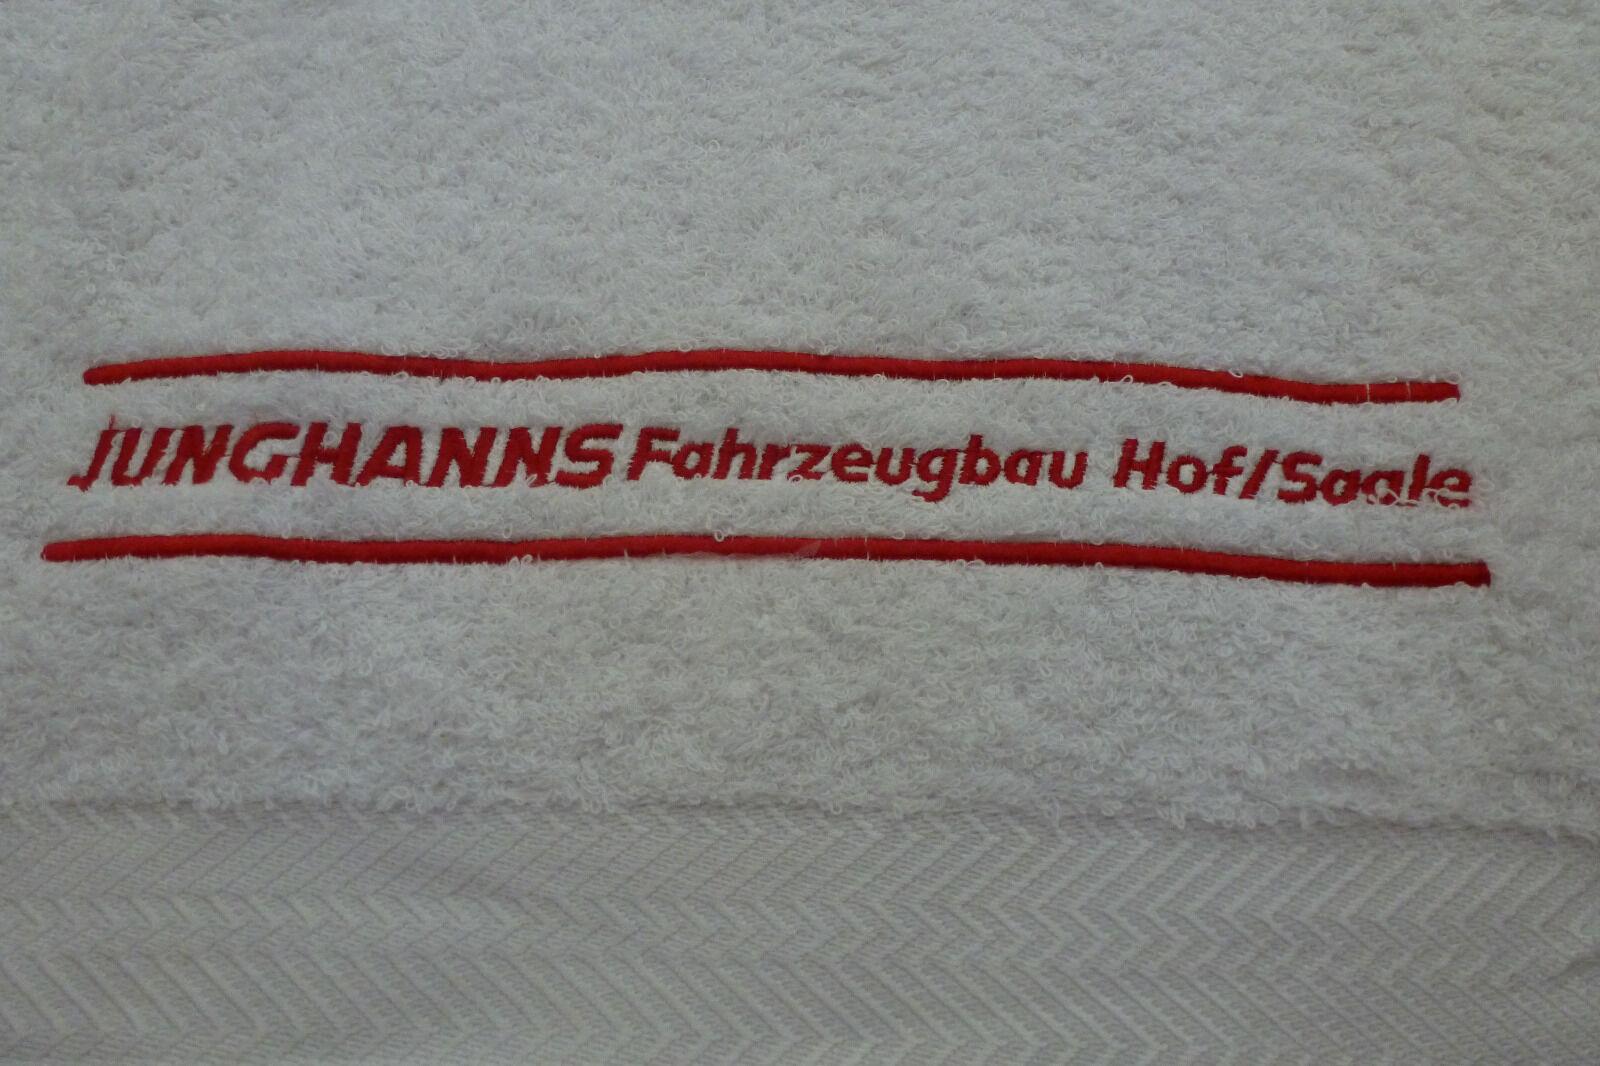 Junghanns LKW Fahrzeugbau Hof Saale Badetuch Handtuch Jorzolino 140x70cm     | Sonderpreis